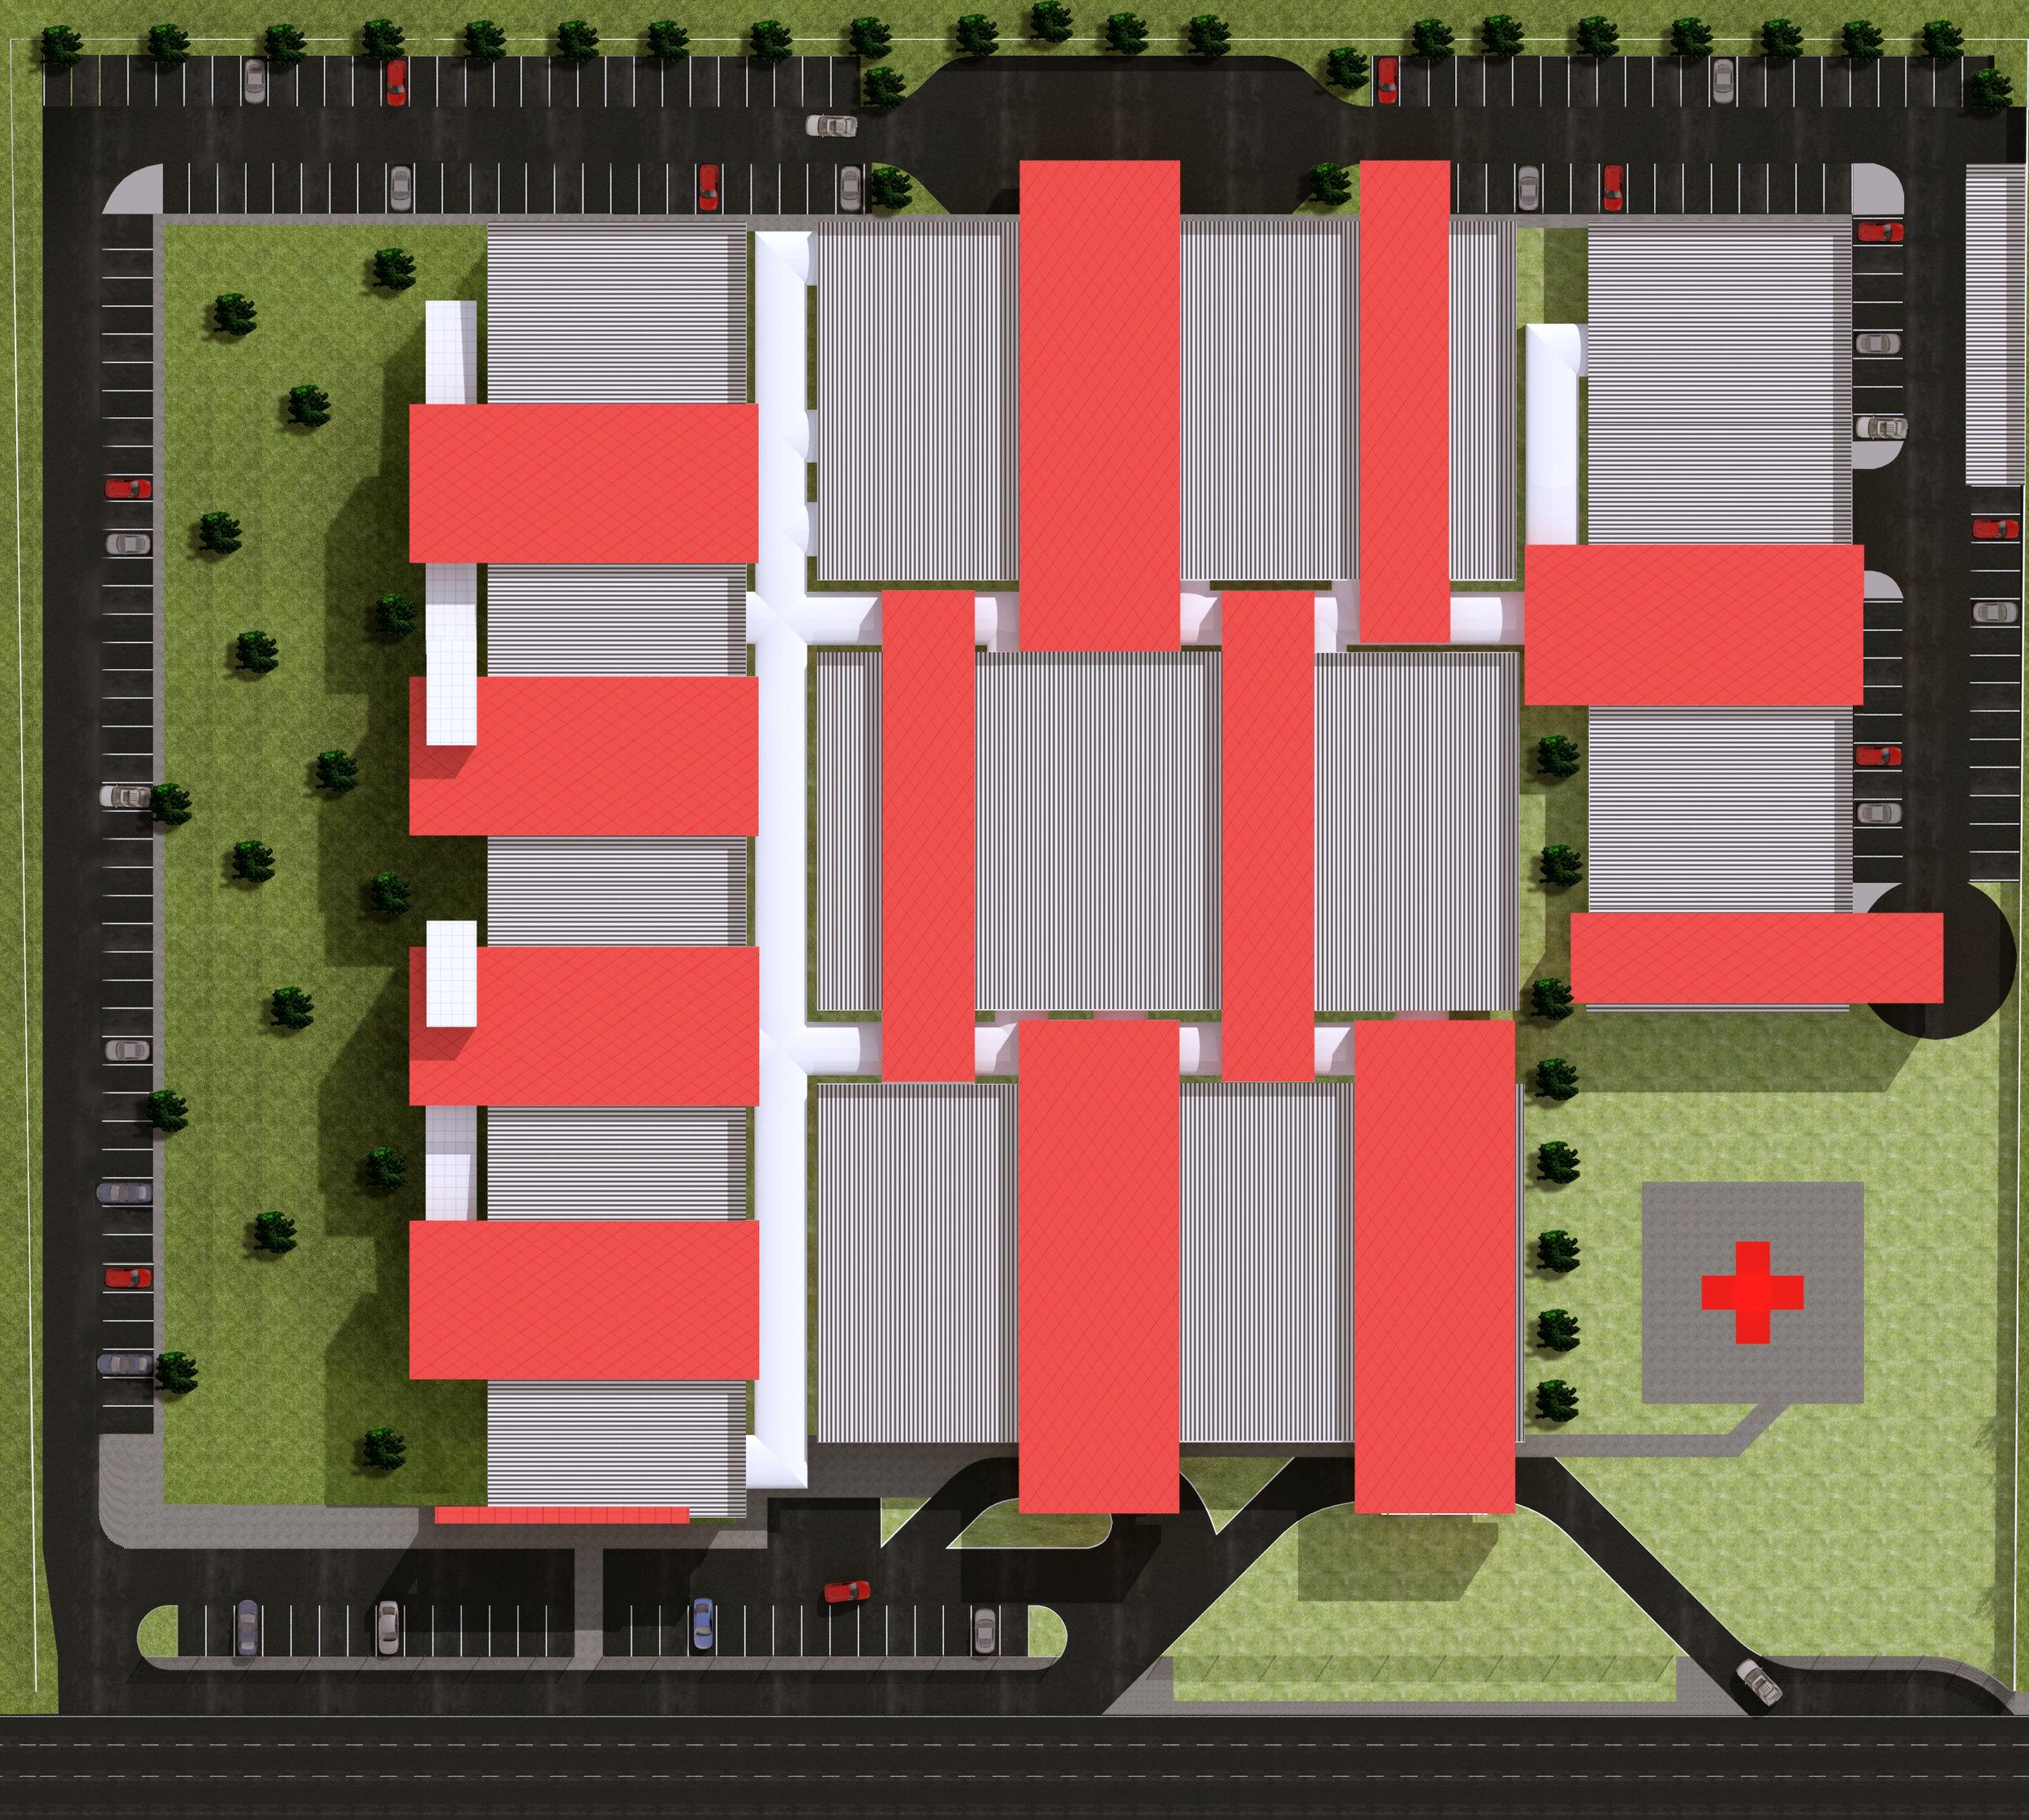 projeto-arquitetonico-hospitalestado-duo-arquitetura-01.jpg